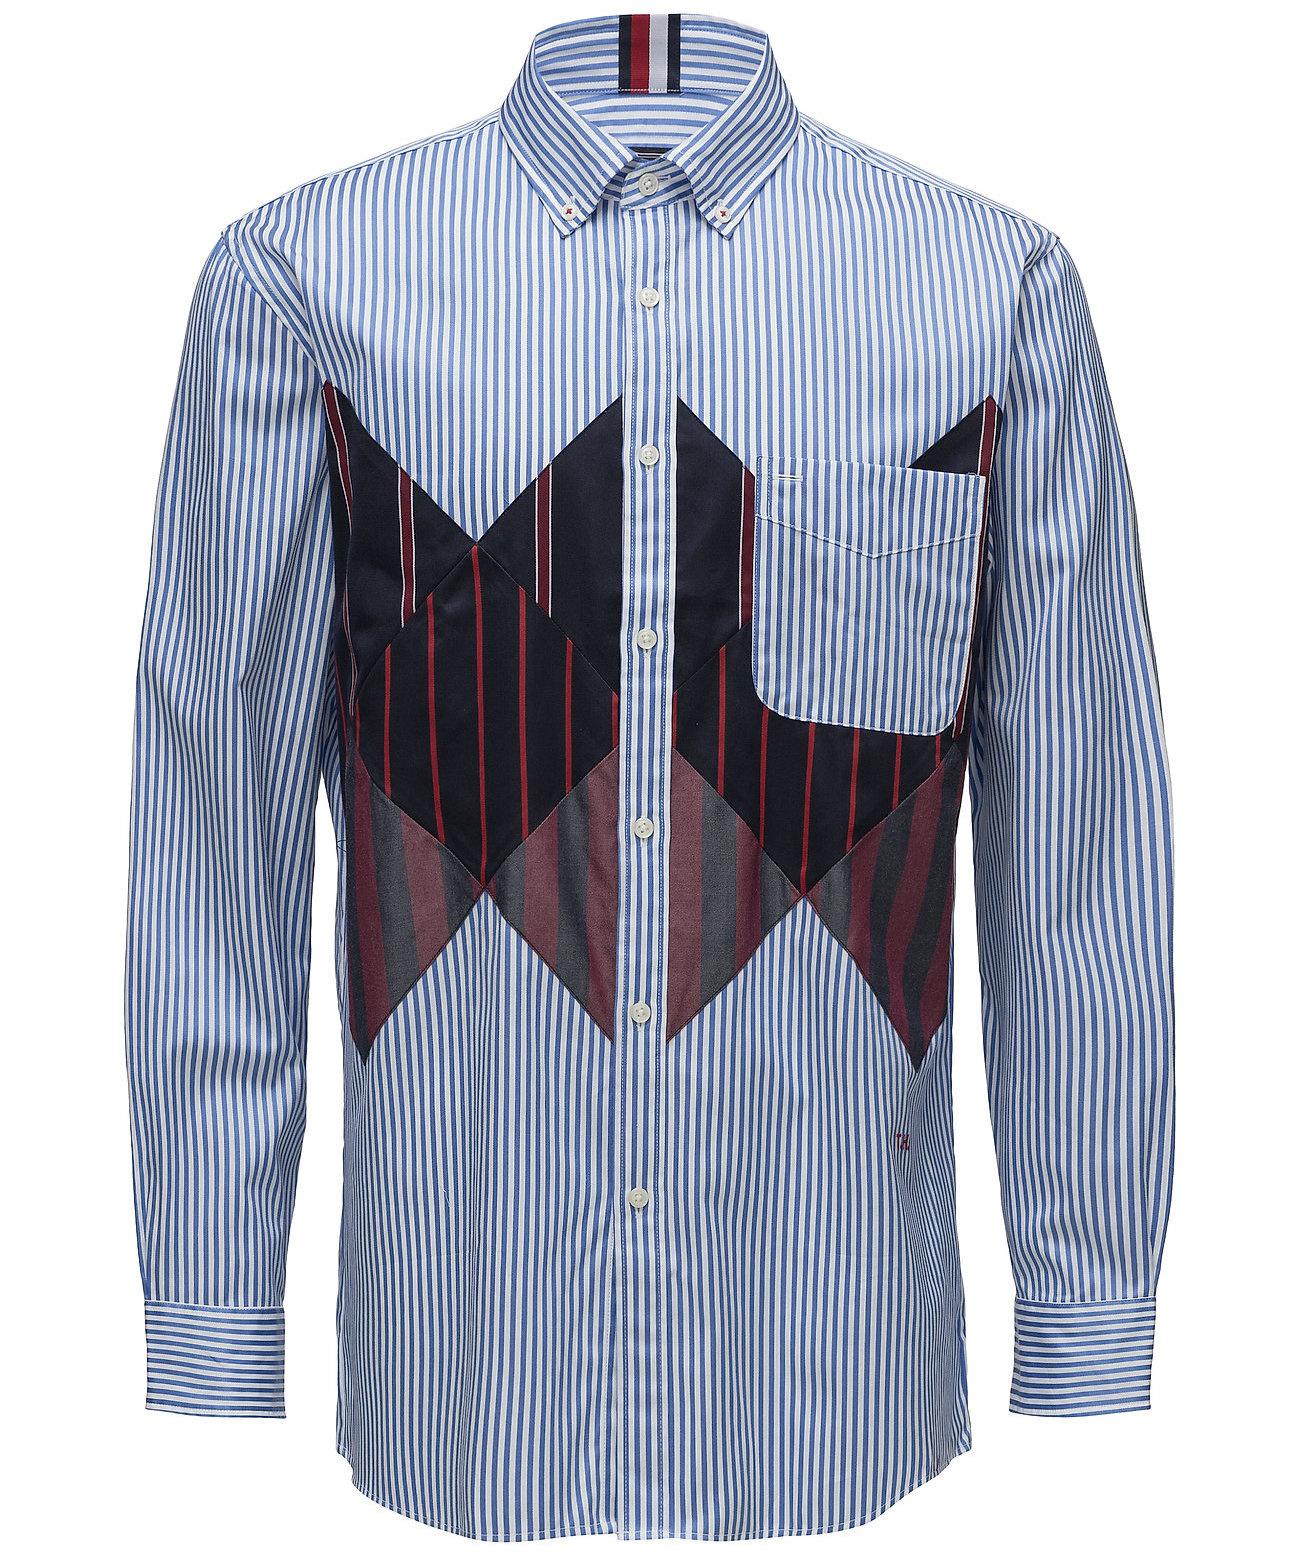 Tommy Hilfiger gestreept overhemd, blauw